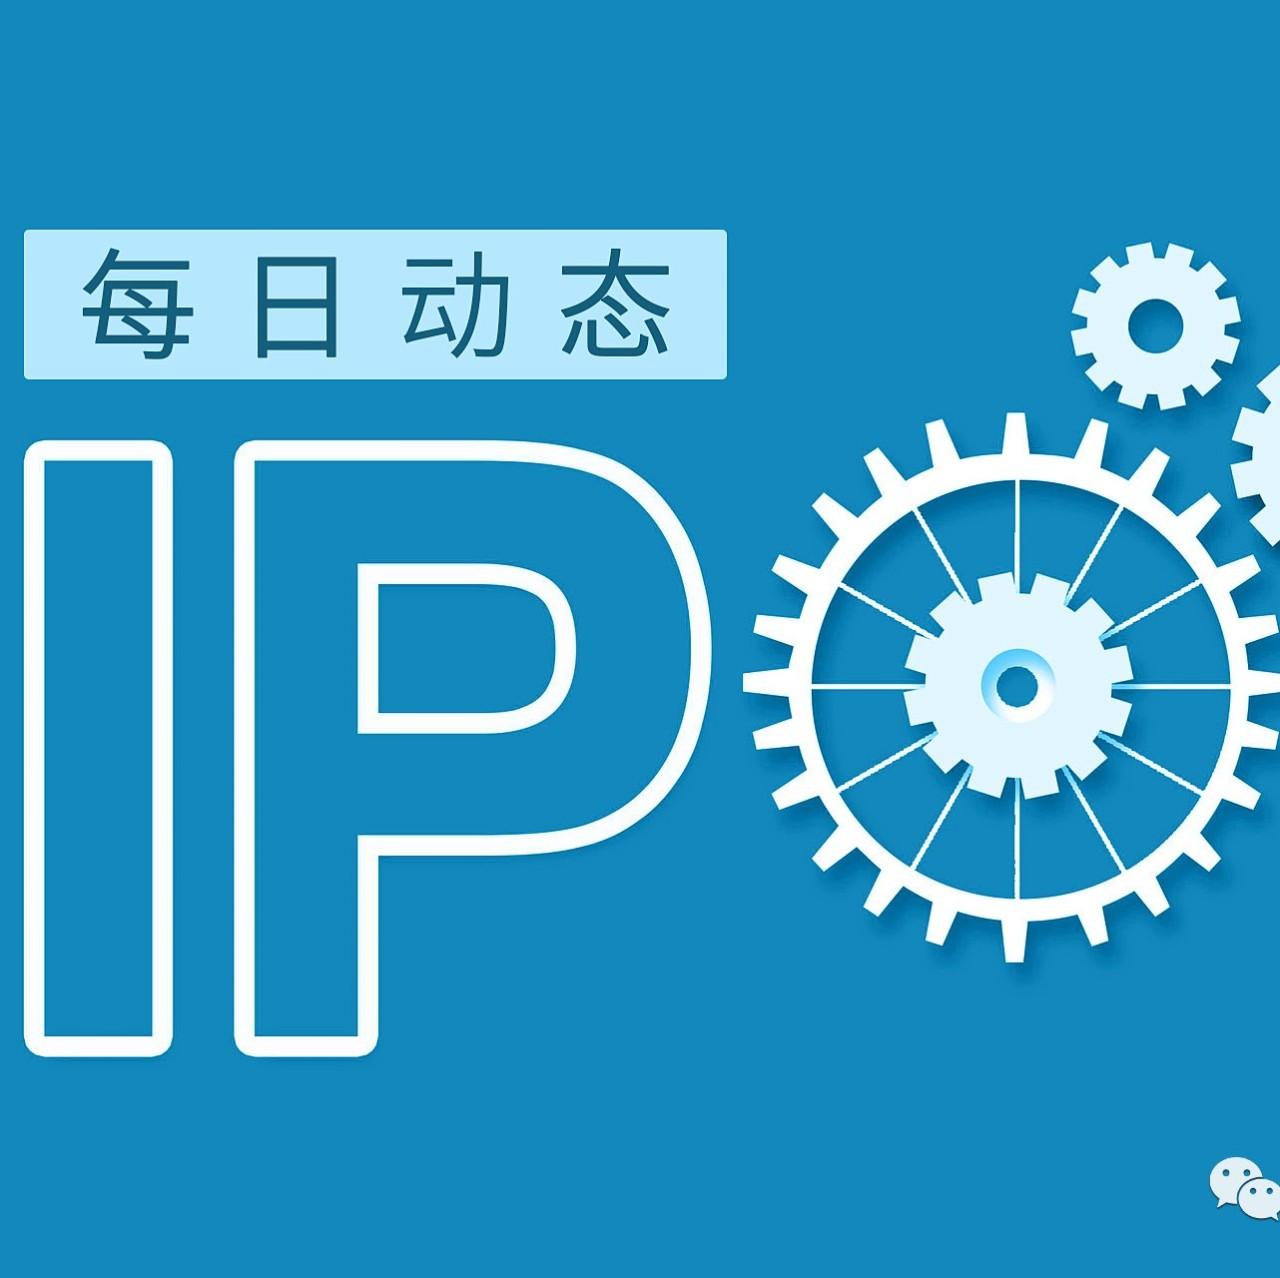 IPO每日动态 | 富石金融港股递交招股书,久趣英语完成数亿元 C1 轮融资